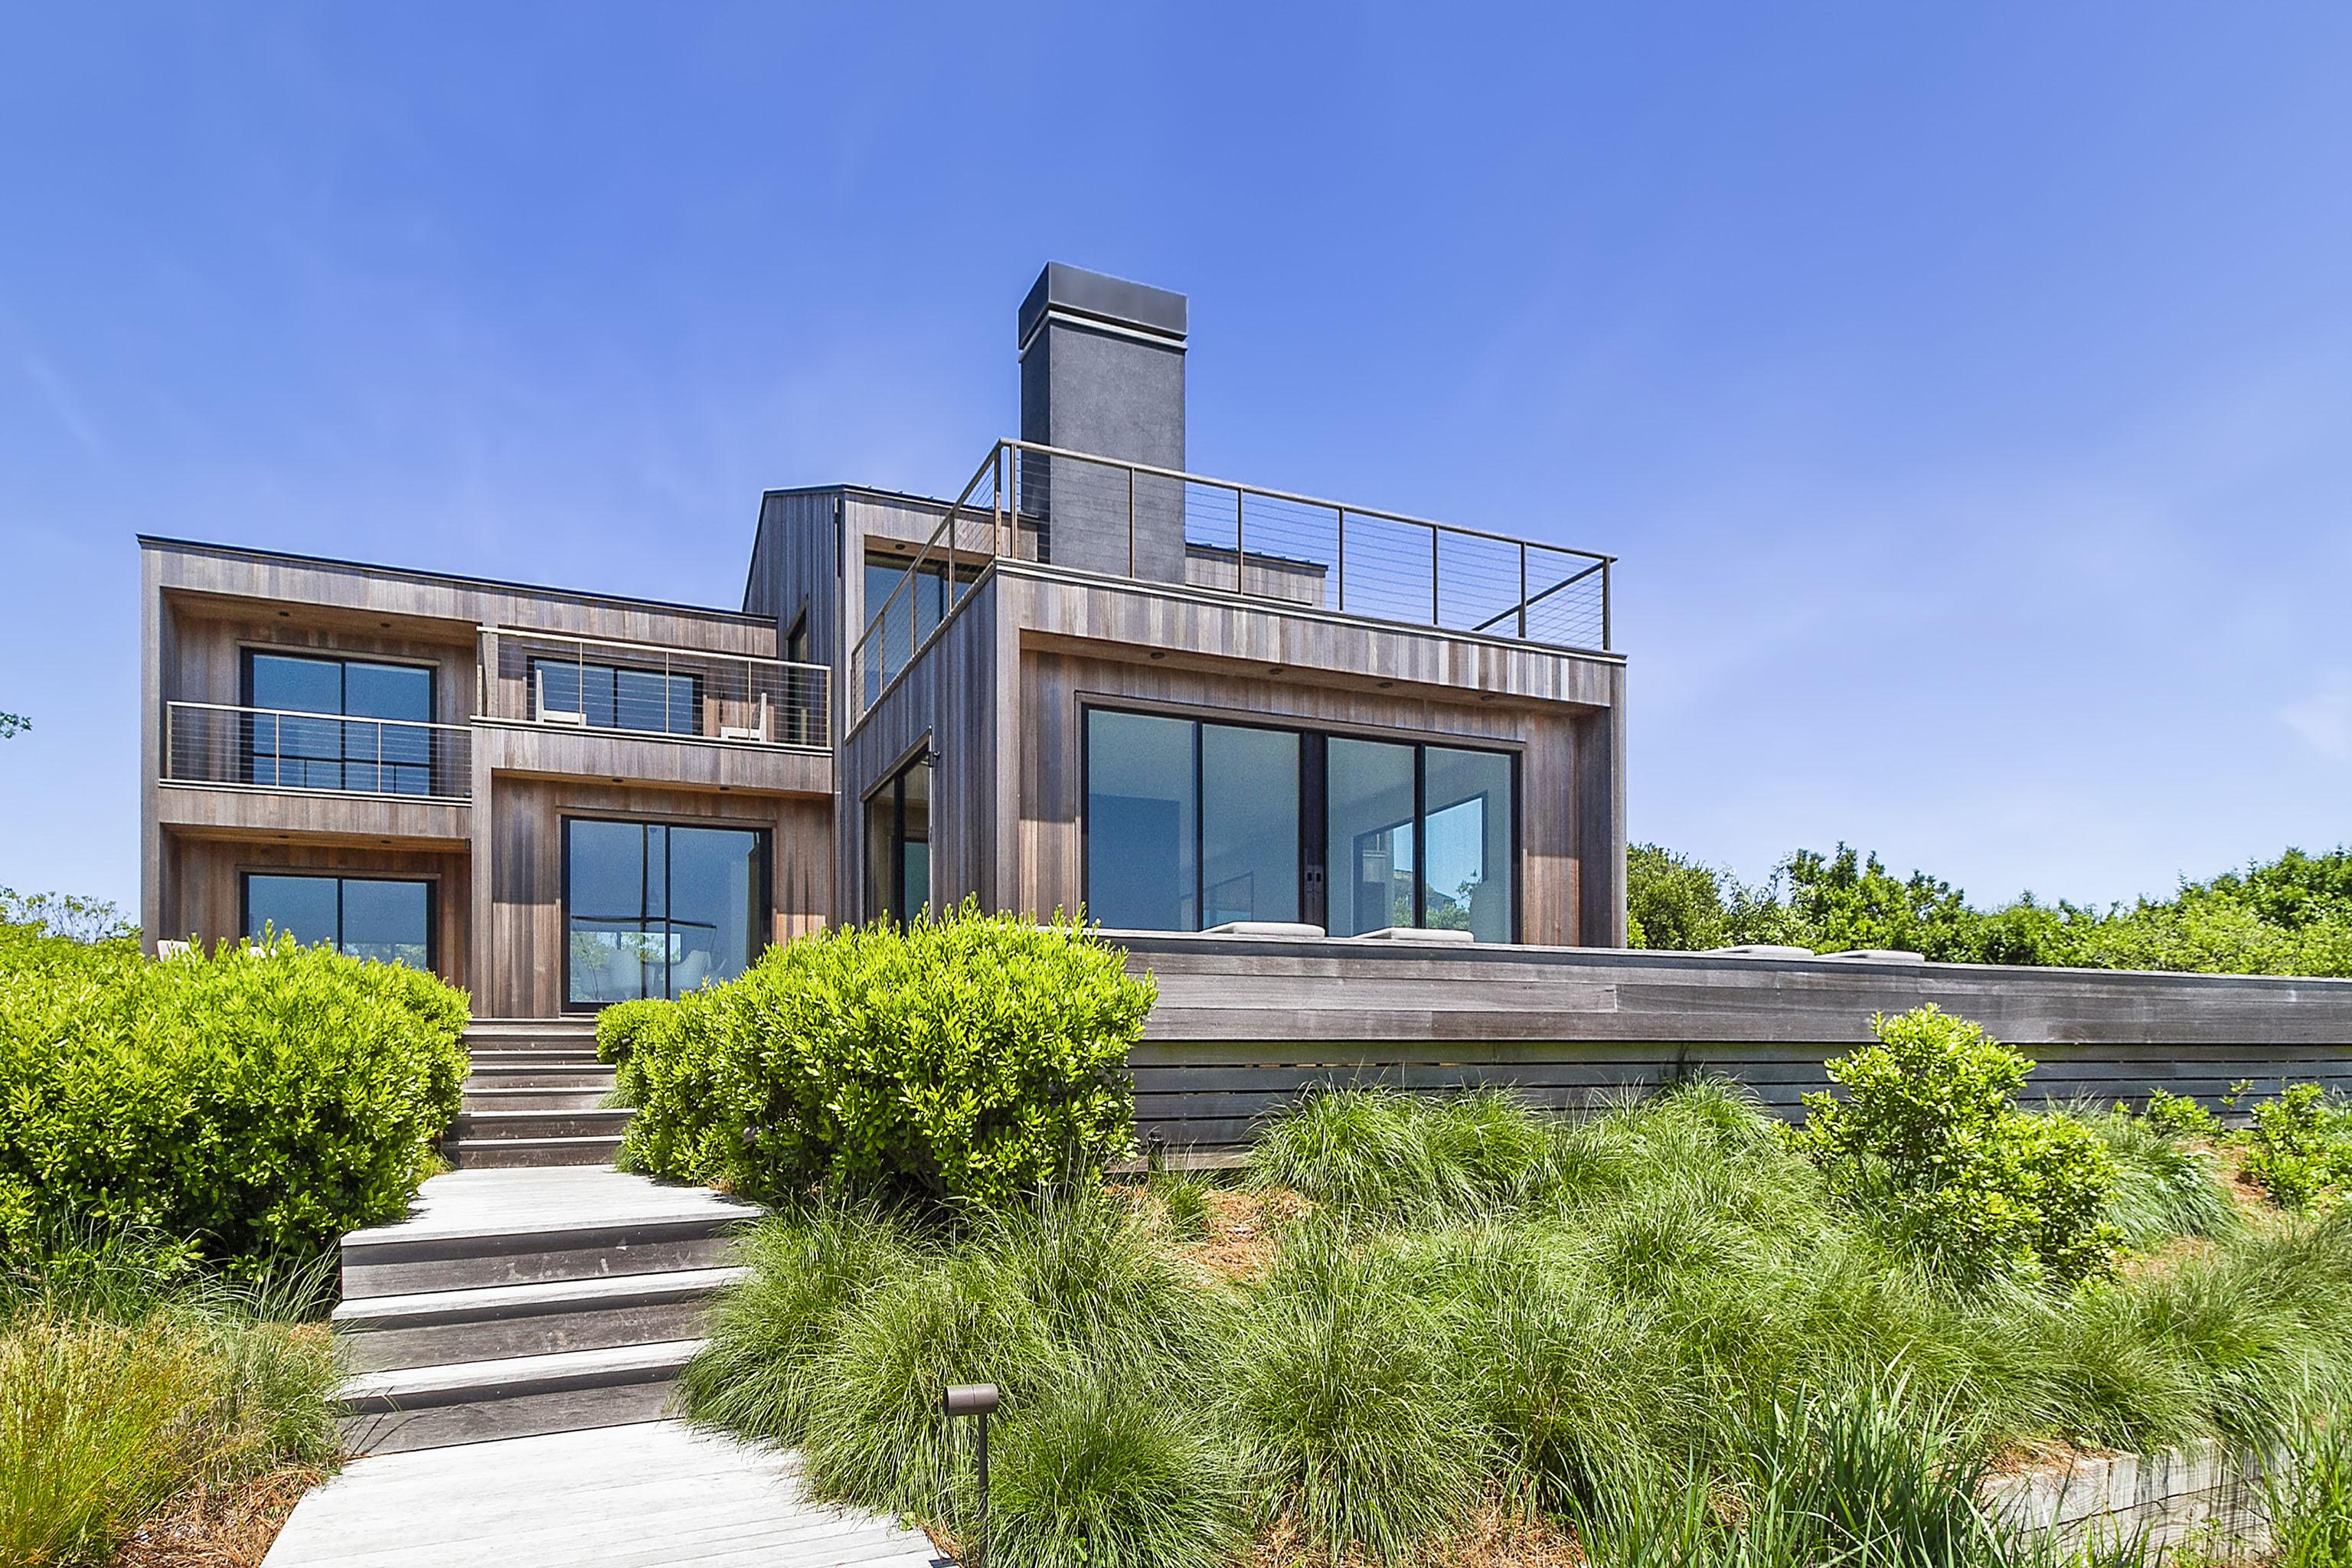 Tomas Maier Lists $21M Montauk Mansion